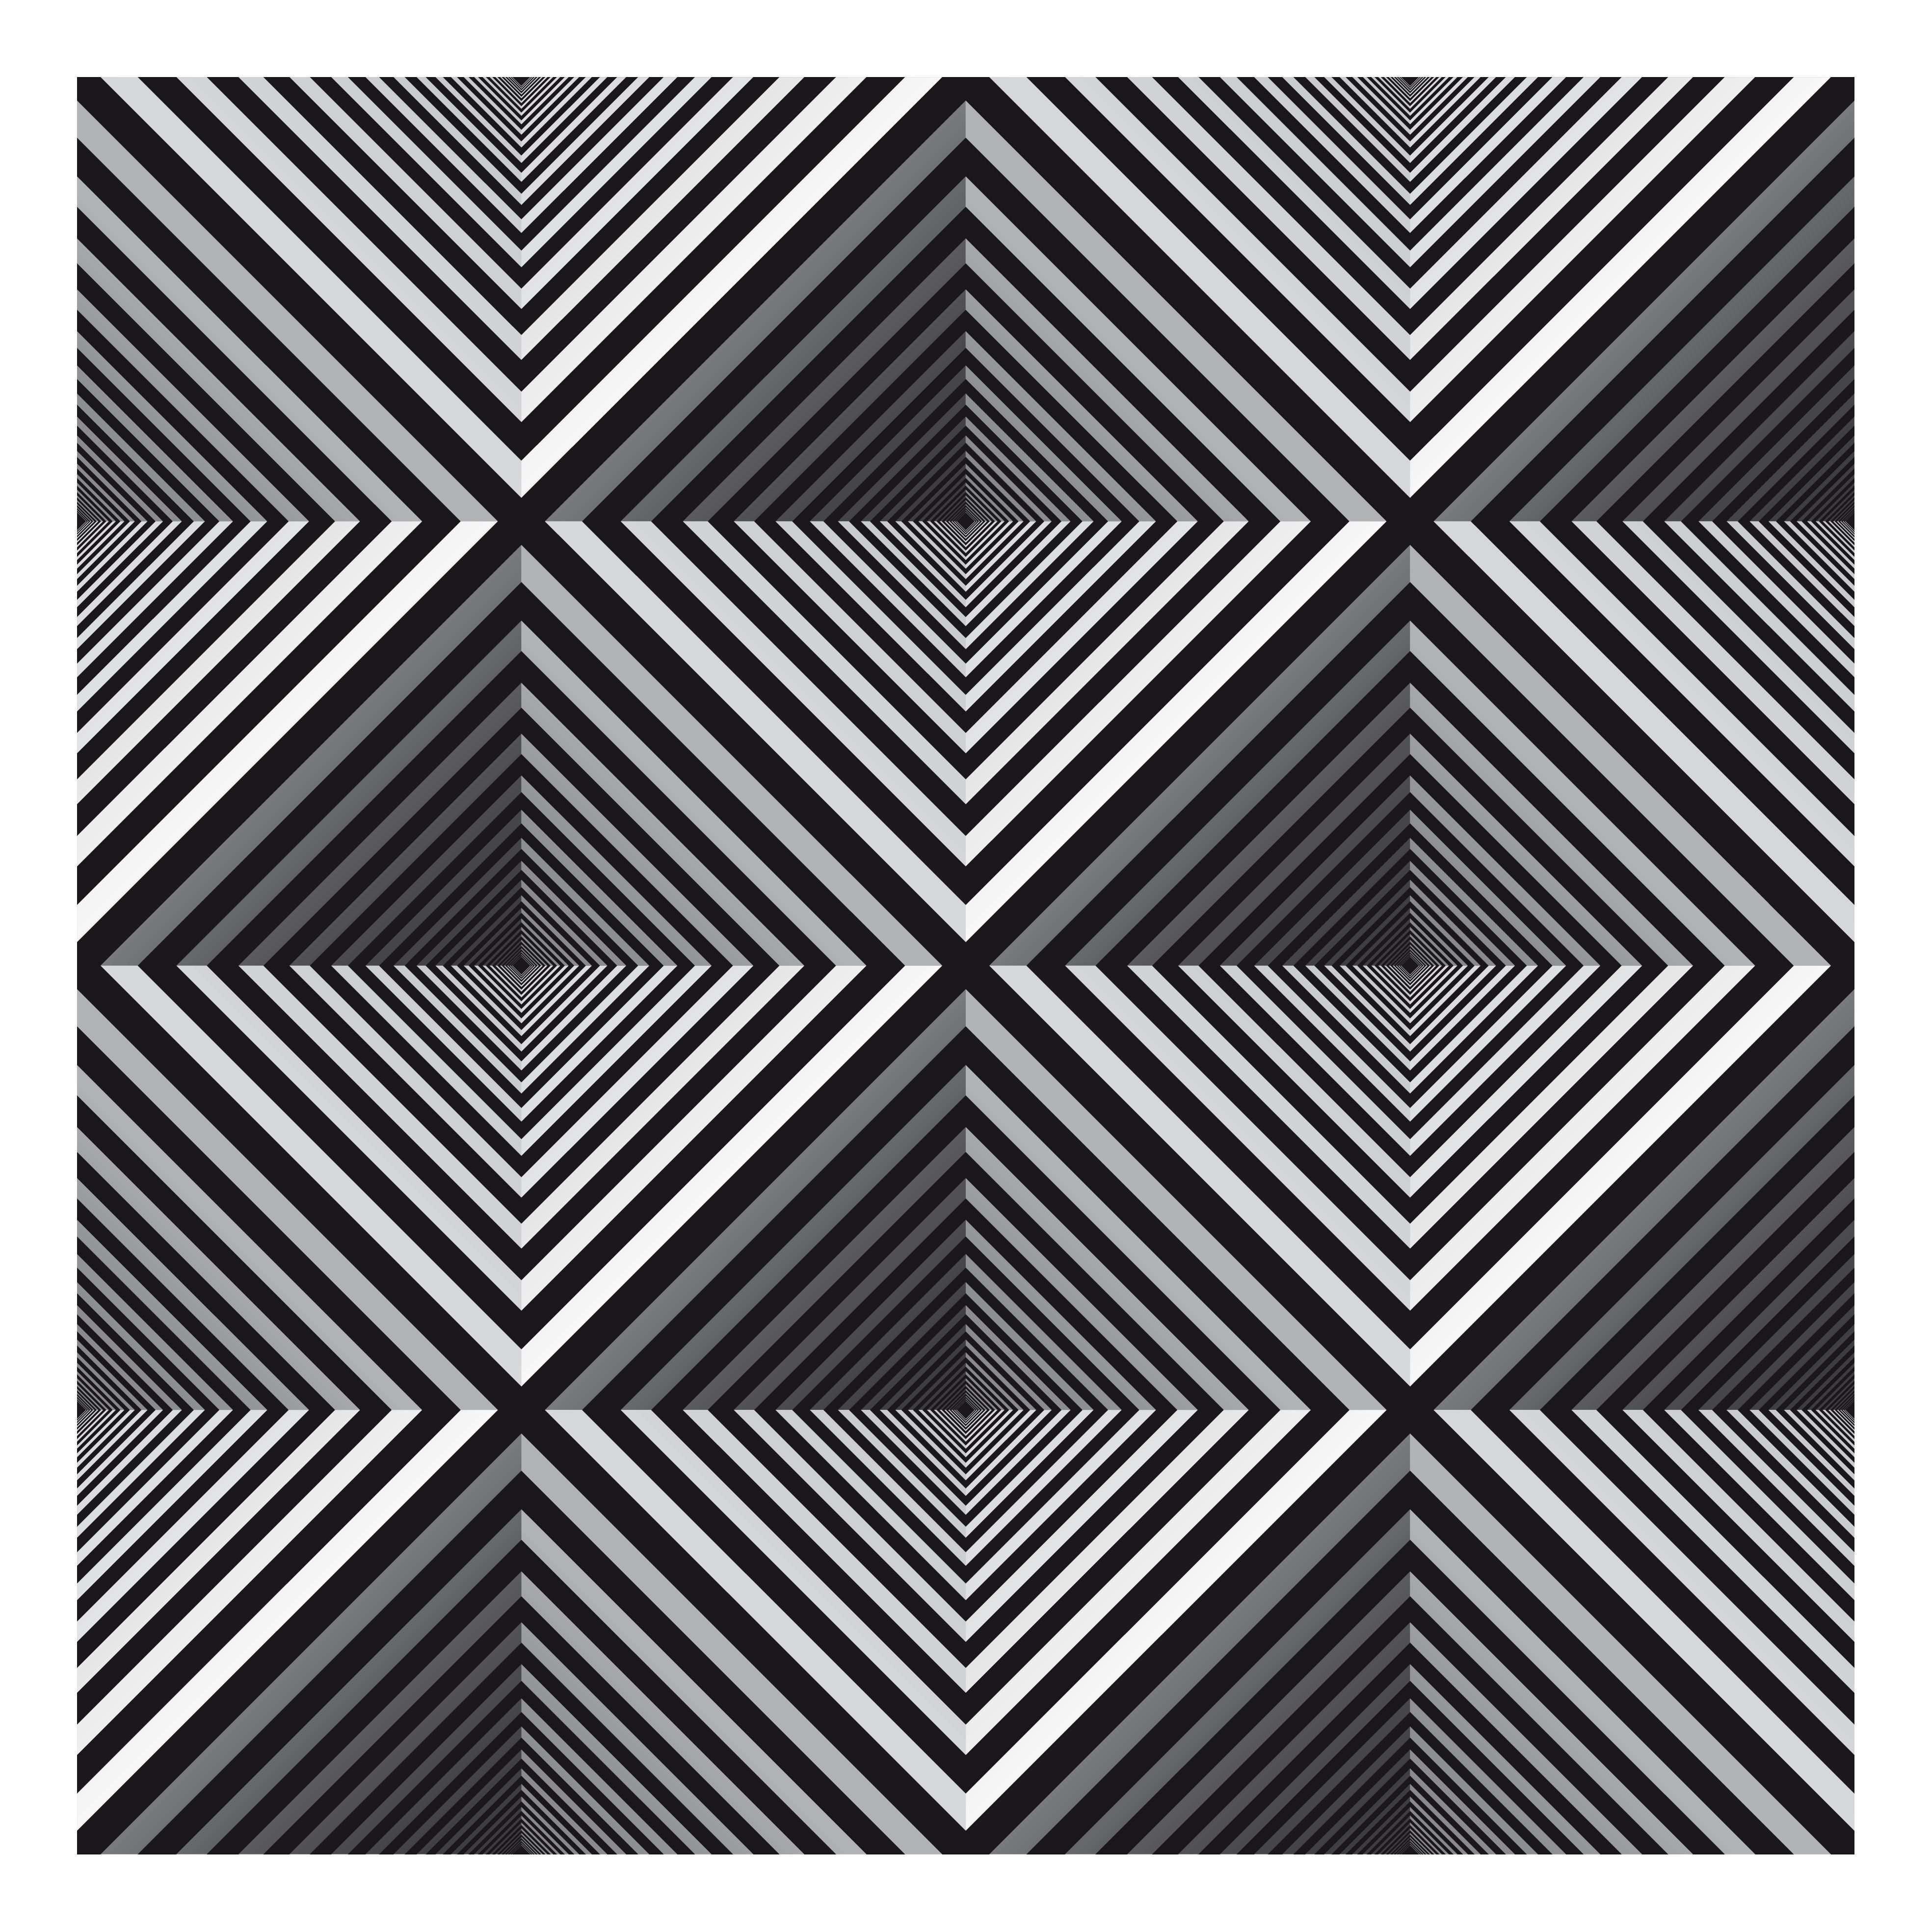 Four Hollow Pyramids Optik Illuzyon Sanati Optik Yanilsama Iluzyonlar